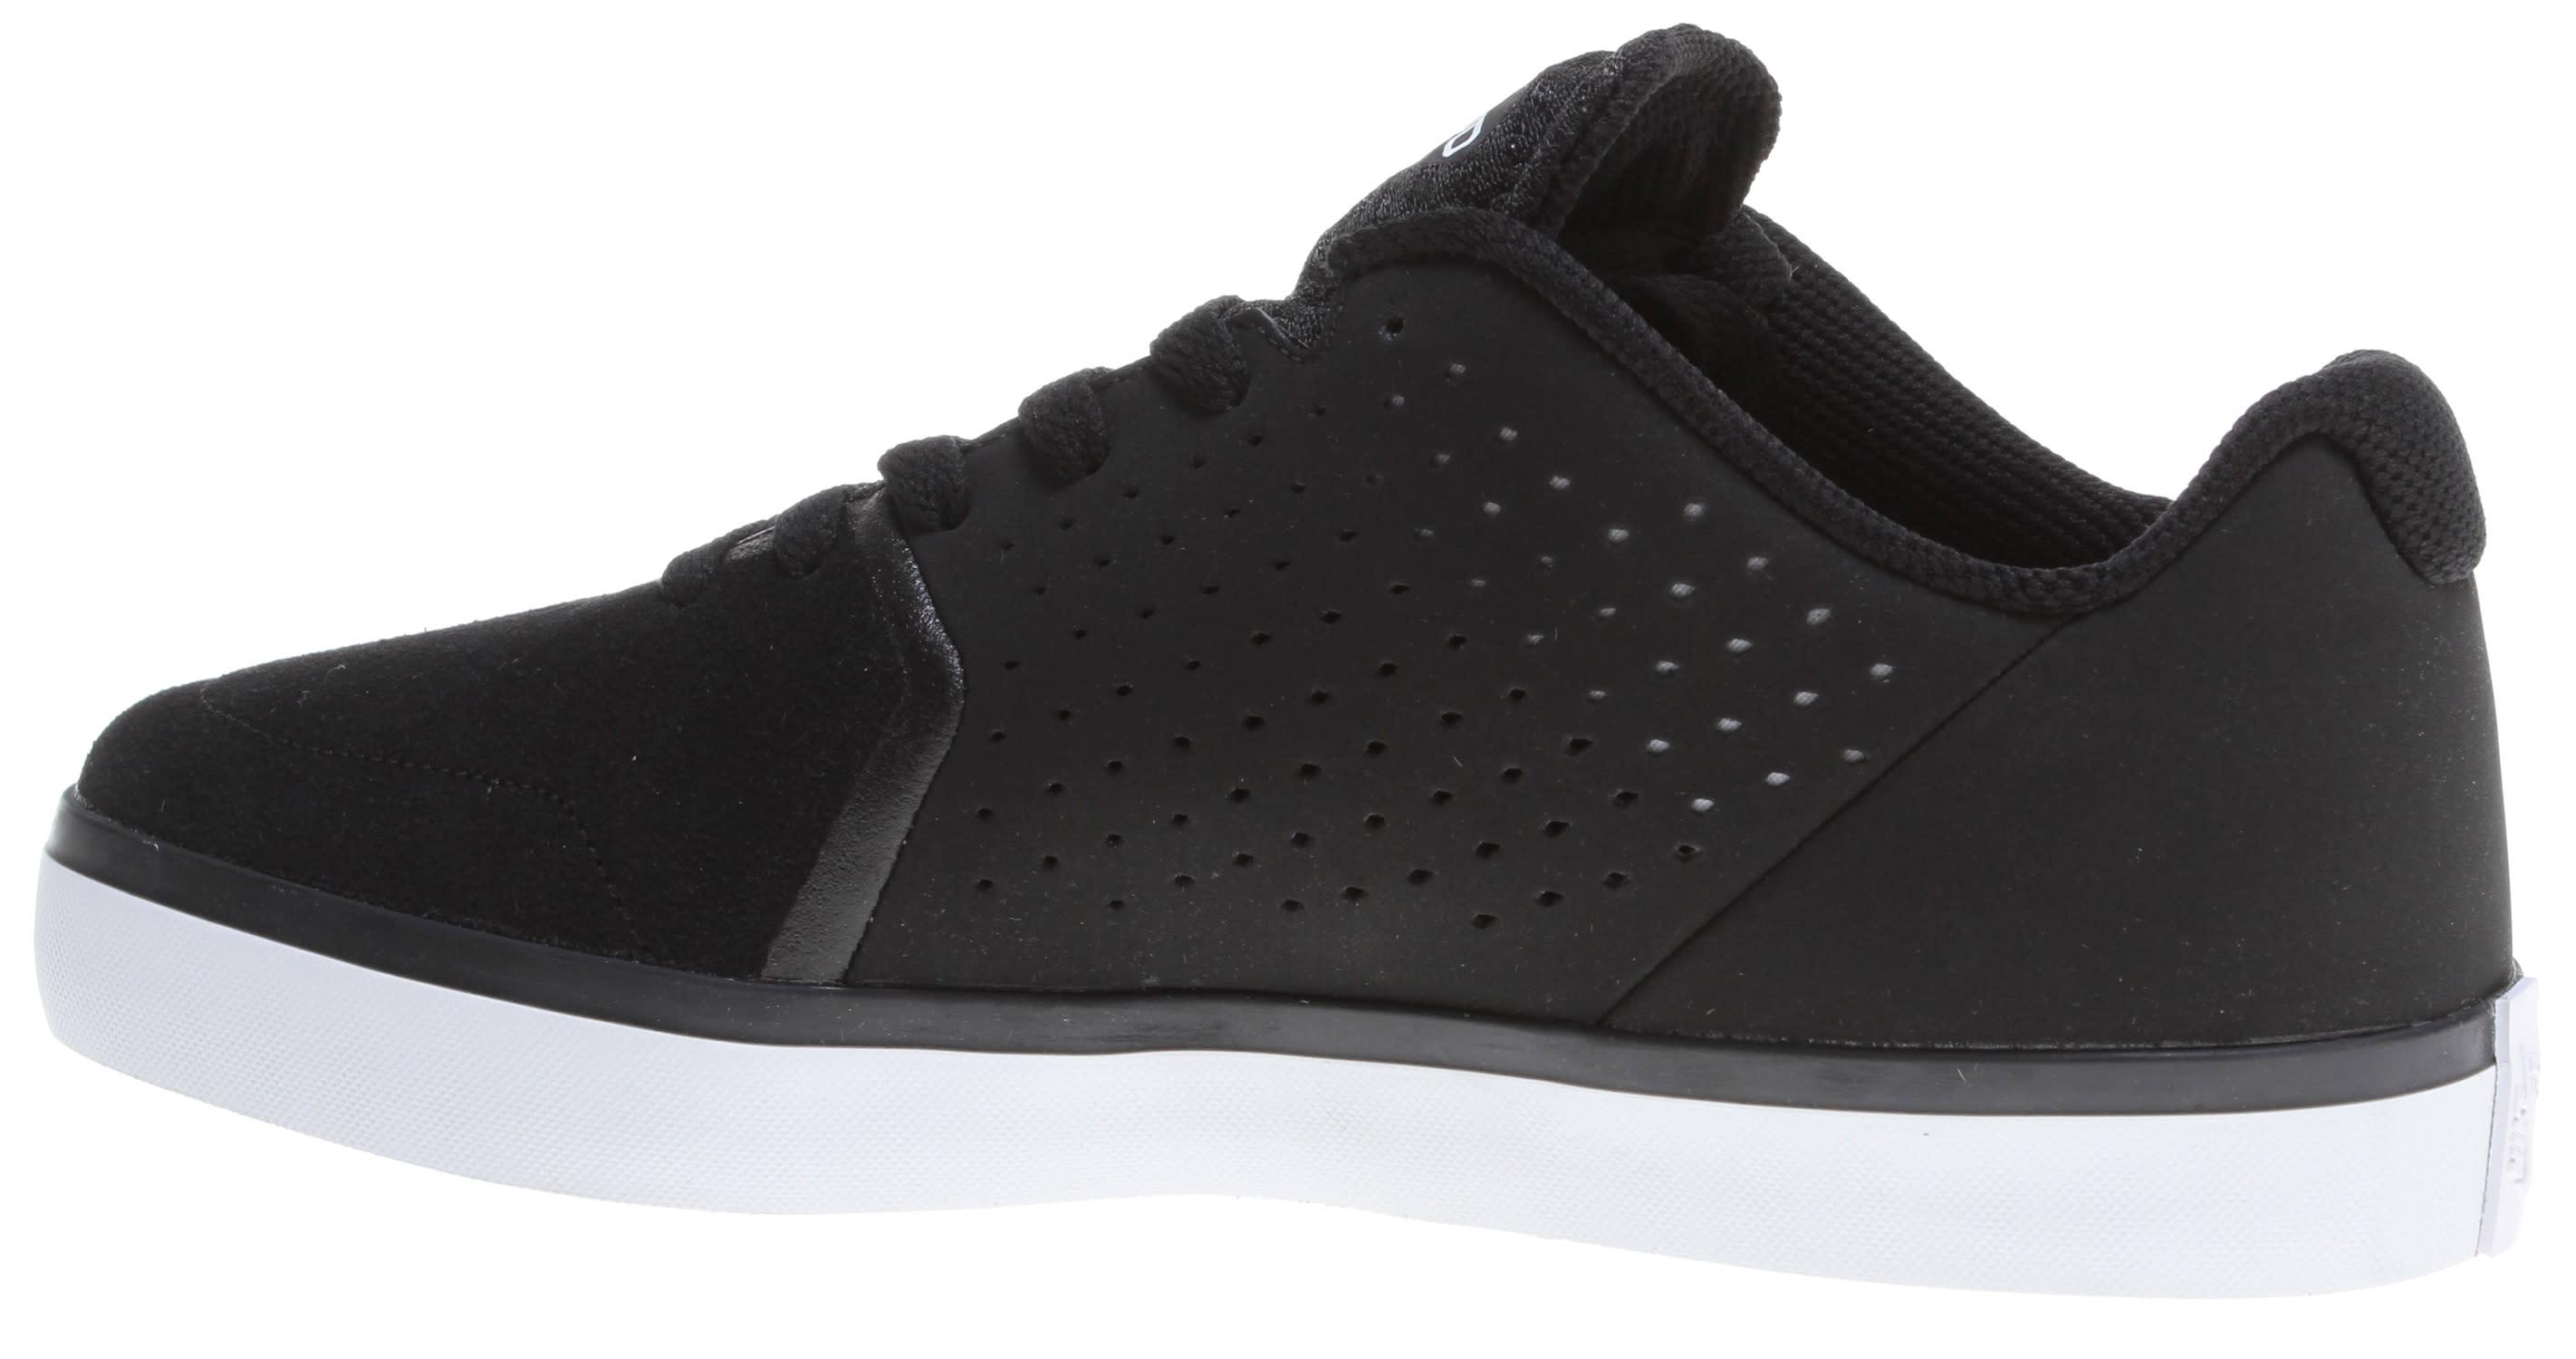 Nike Sb Paul Rodriguez Ctd Lr Skate Shoes